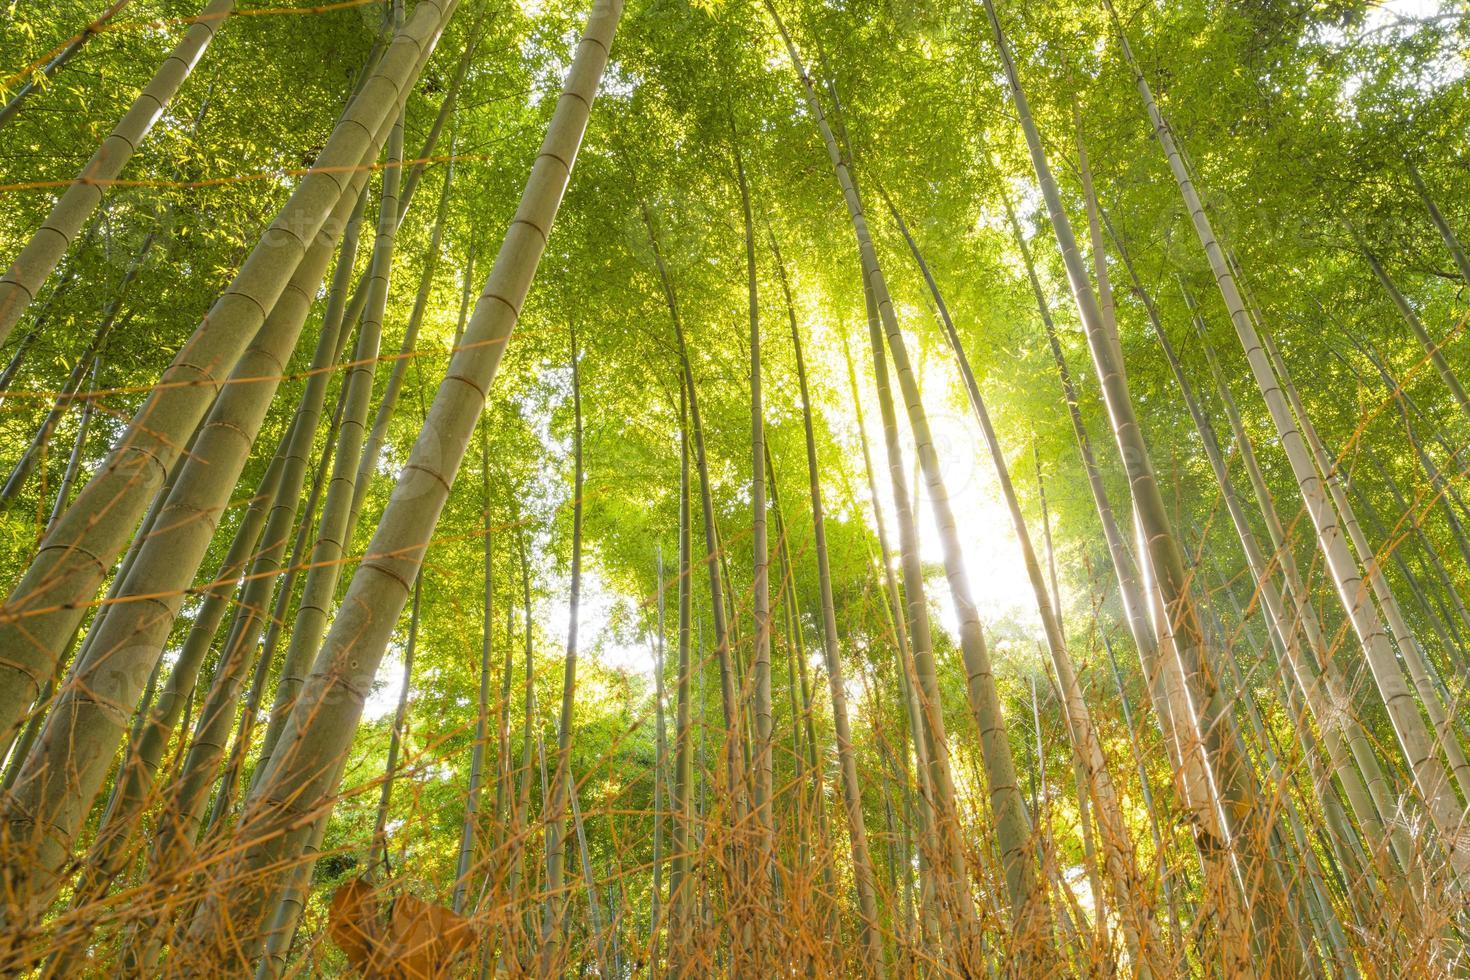 Bambuswald, Kyoto, Japan foto